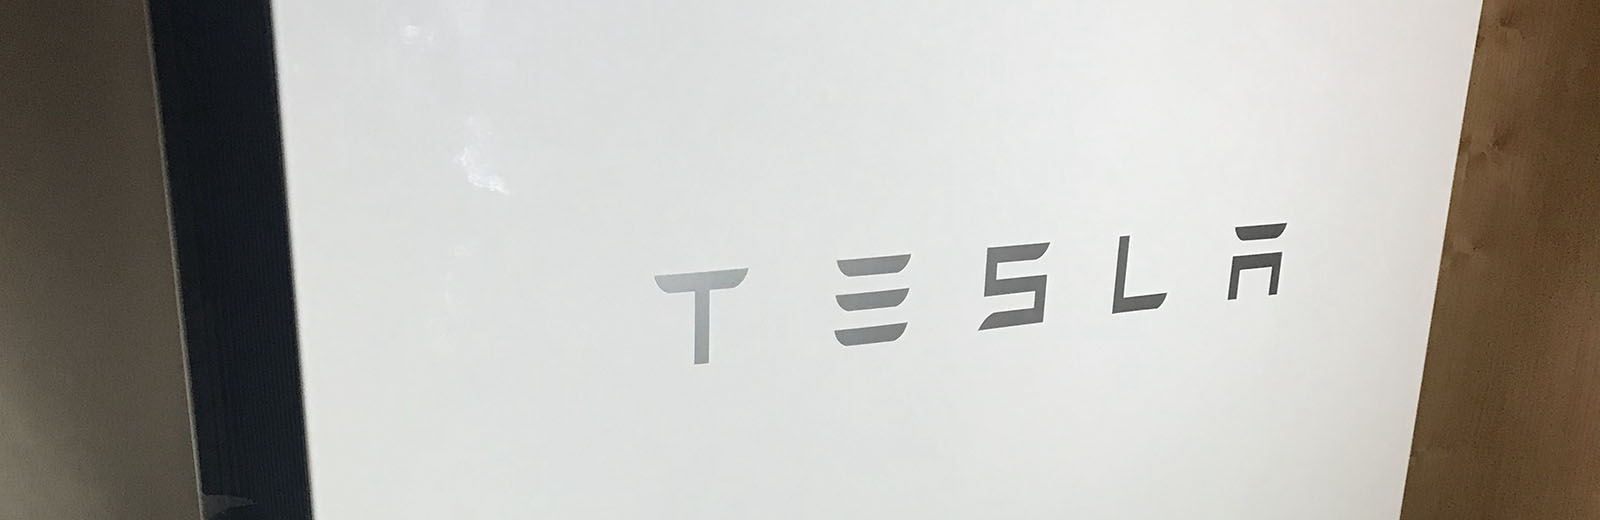 Tesla Powerwall customer install